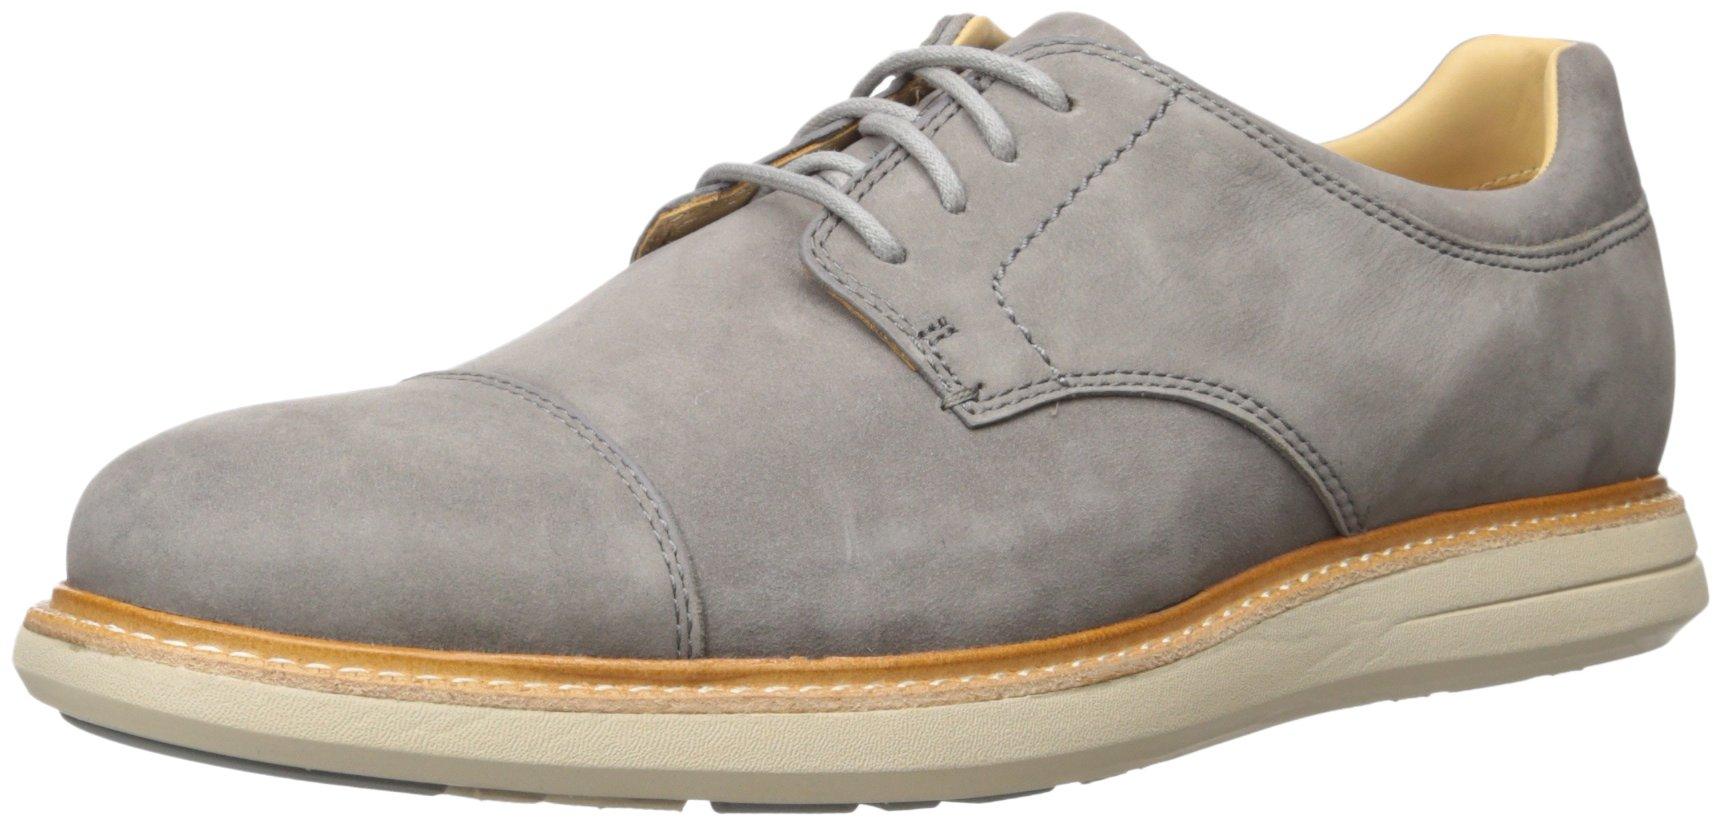 Sebago Men's Smyth Cap Toe Oxford, Dark Grey Nubuck, 7 M US